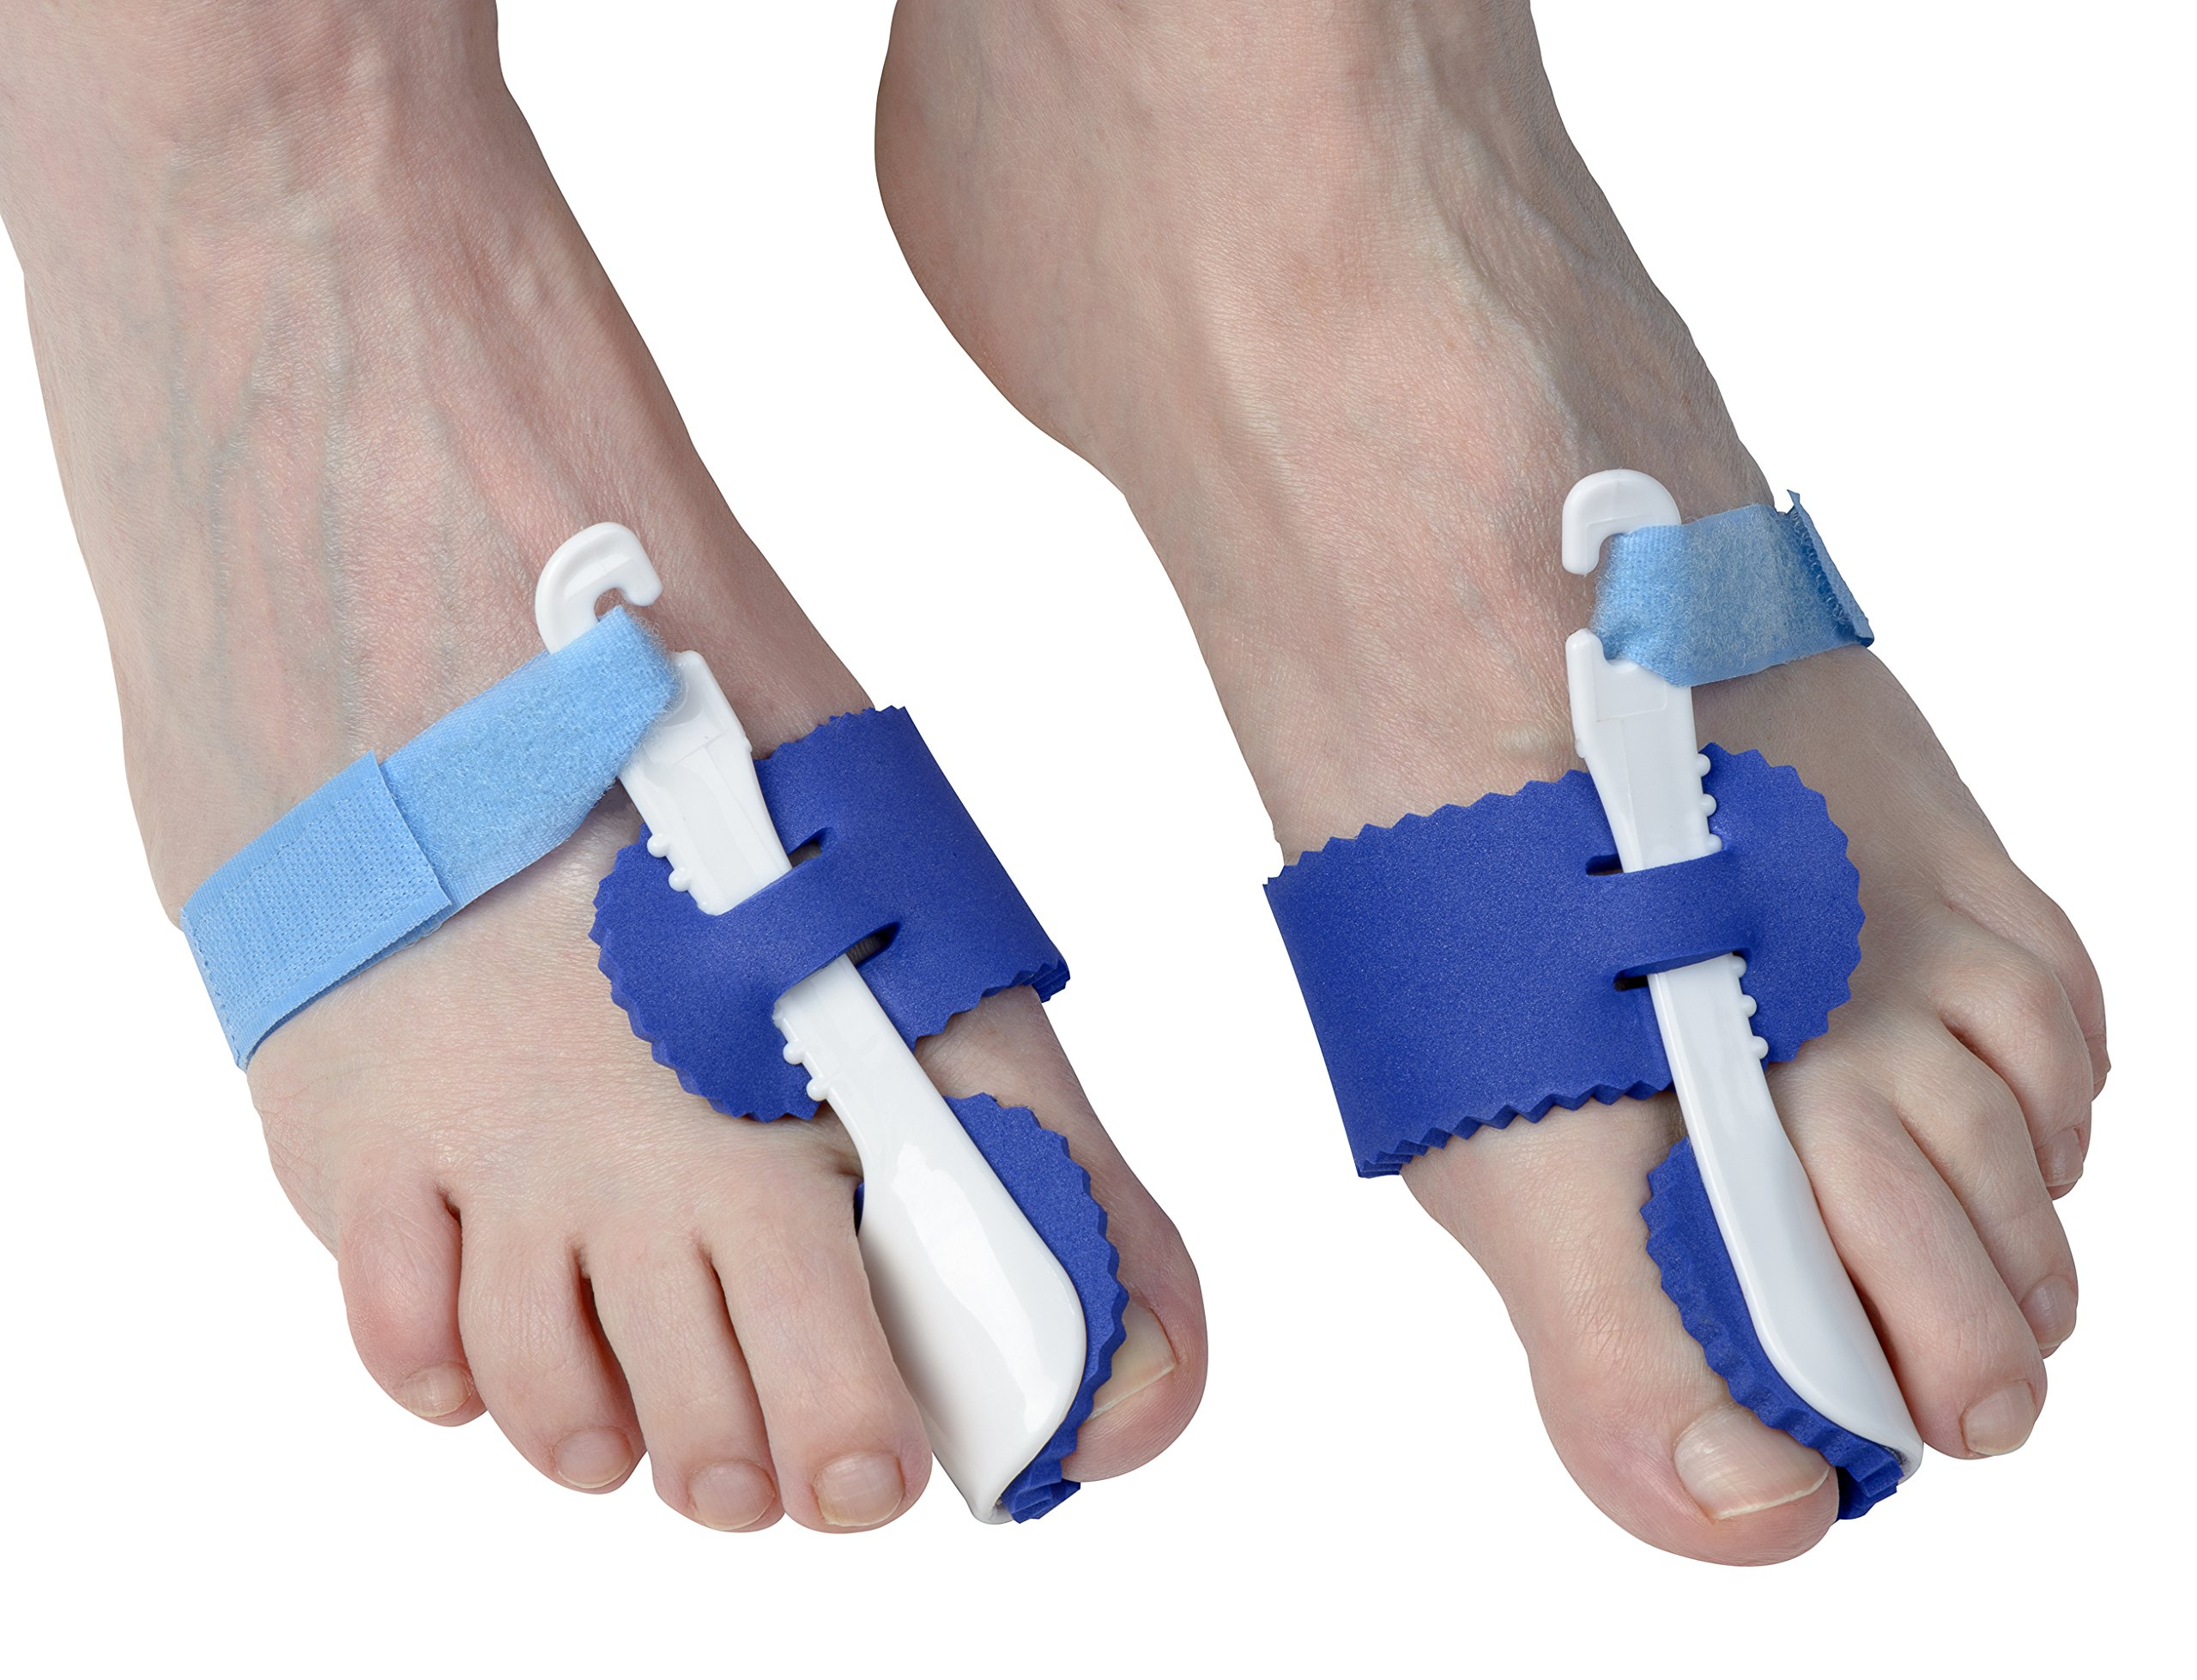 EasyLifeCare One Pair Toe Aid Bunion Corrector Spacers – Foot Orthotics Splints for Hallux Valgus Rehabilitation – Promotes Proper Blood Circulation – Prevents Bone Deformities, Big Hammer Toe Bump Lump, Arthritic Feet & Leg Muscle Pain – Soothe S